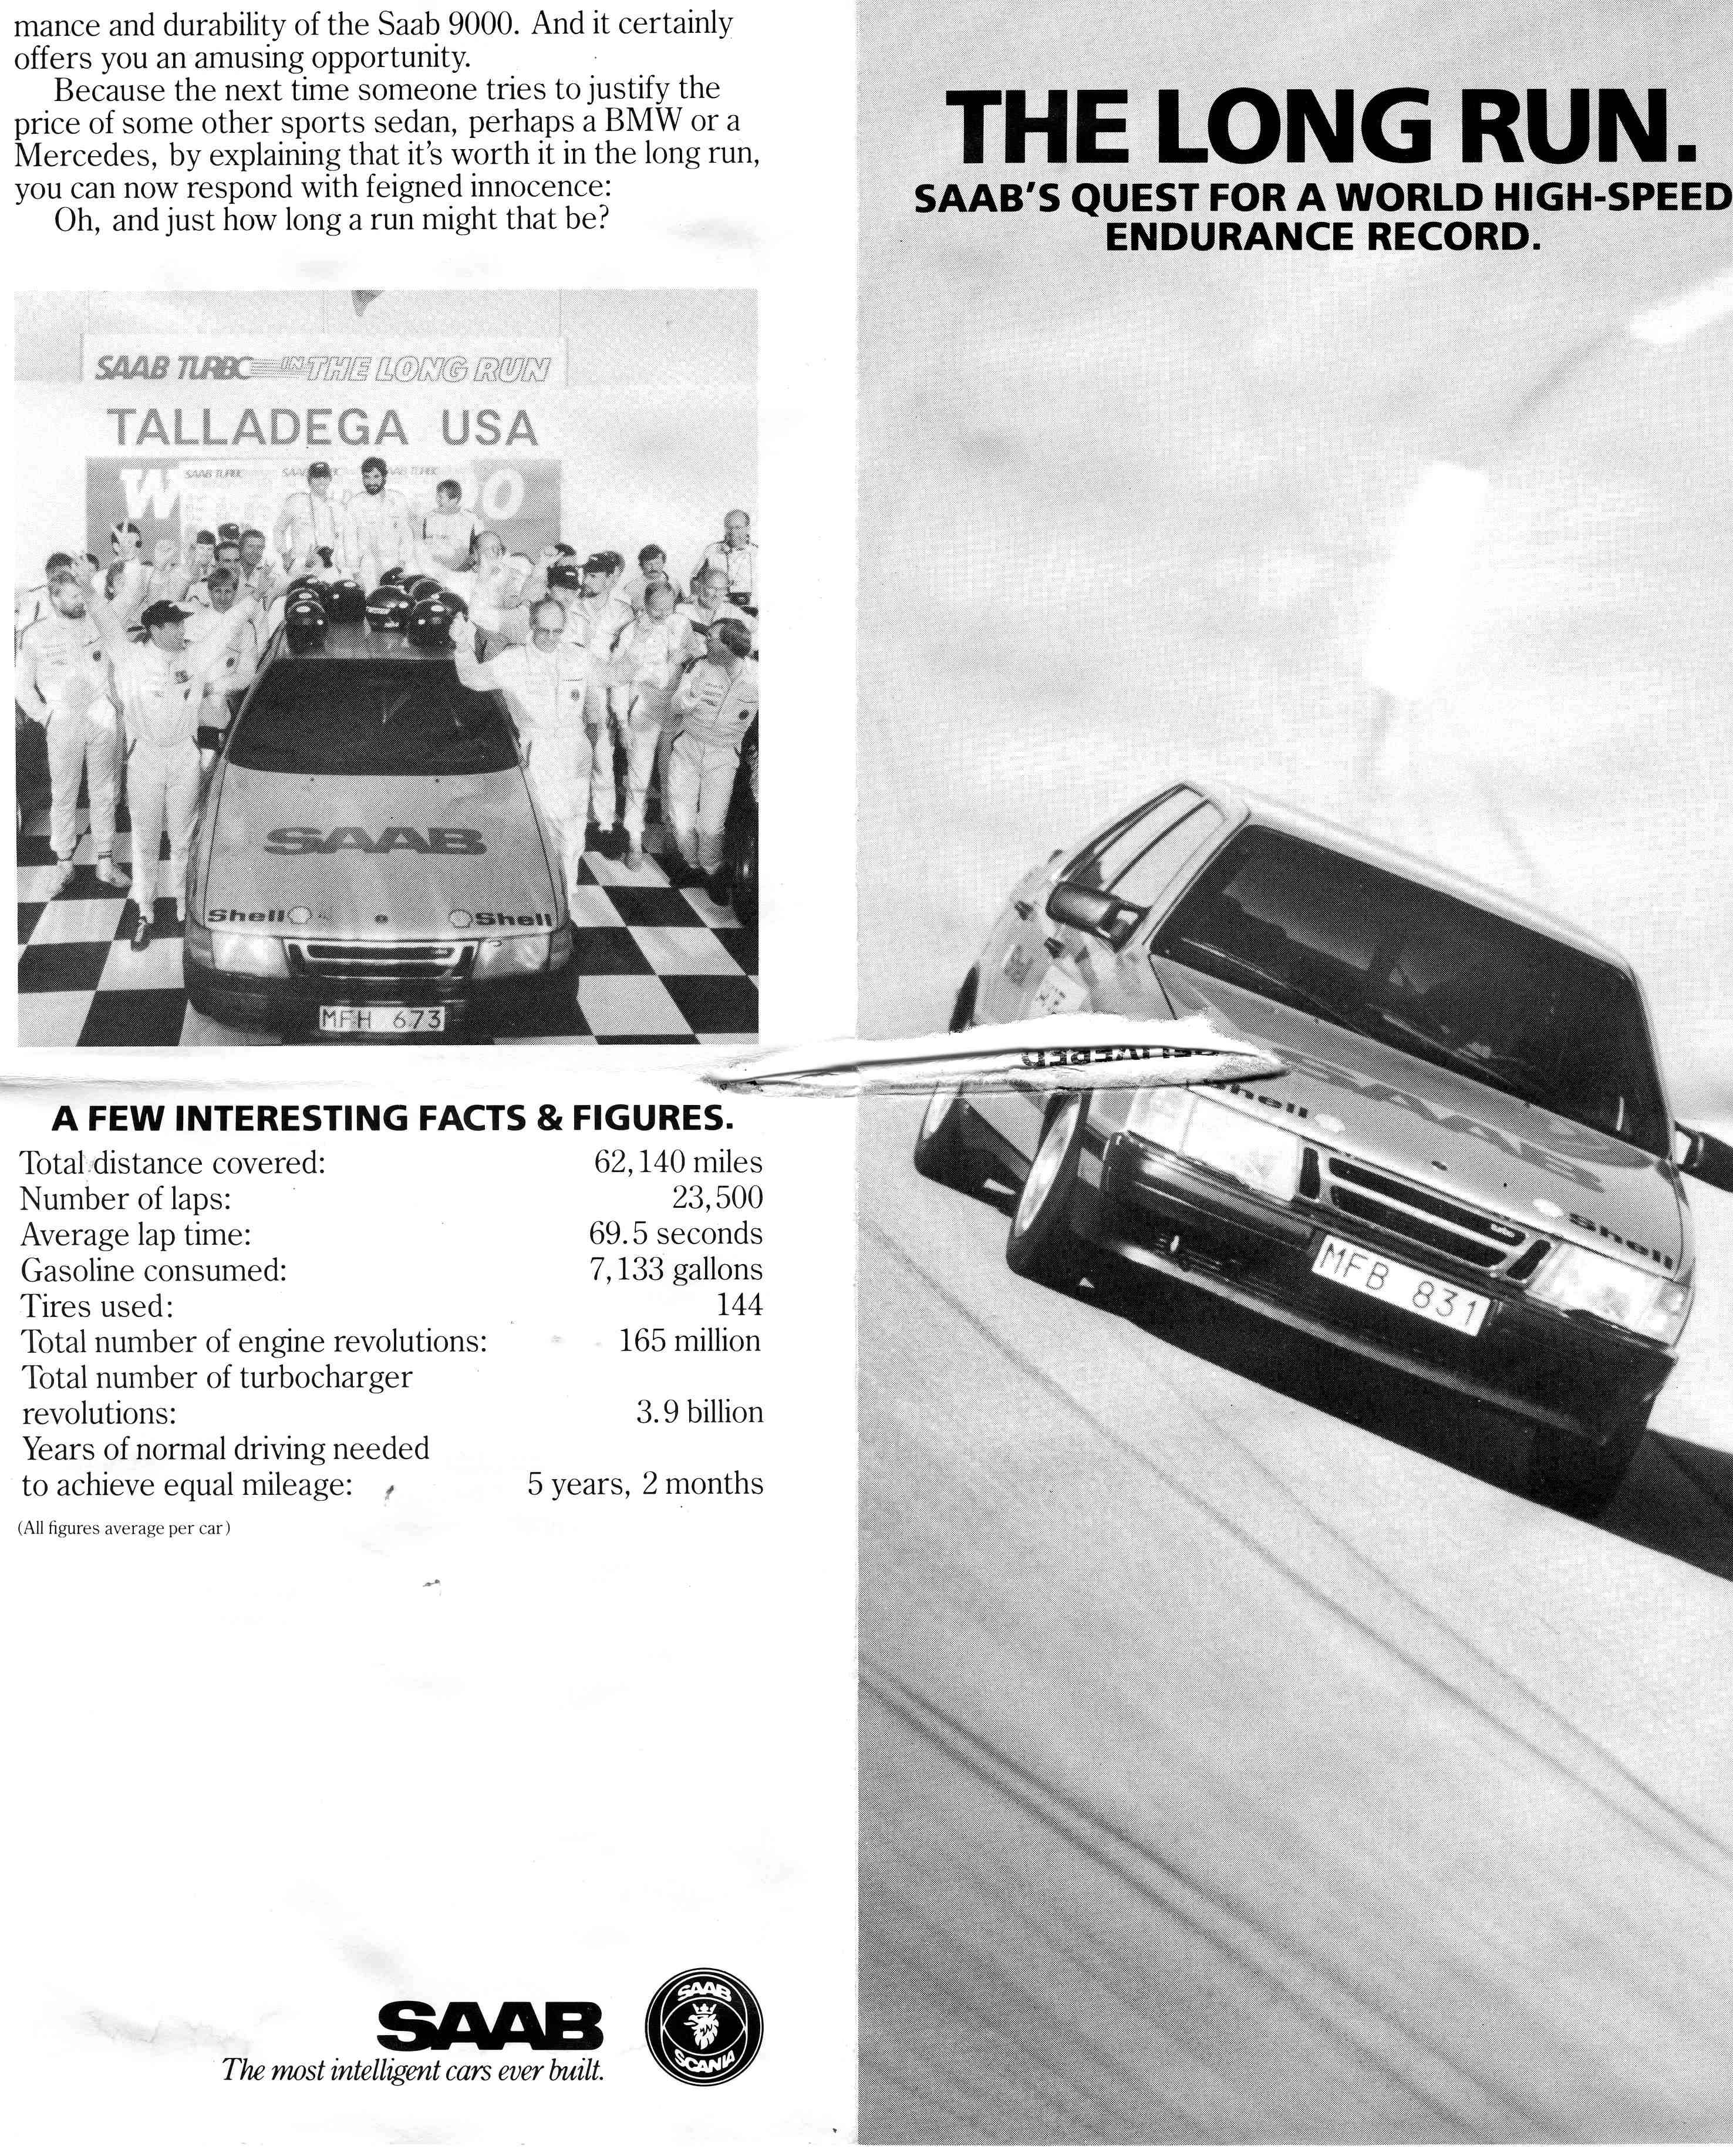 1987 Saab 9000 Taladega Challenge (Now at Tom Donney Motors